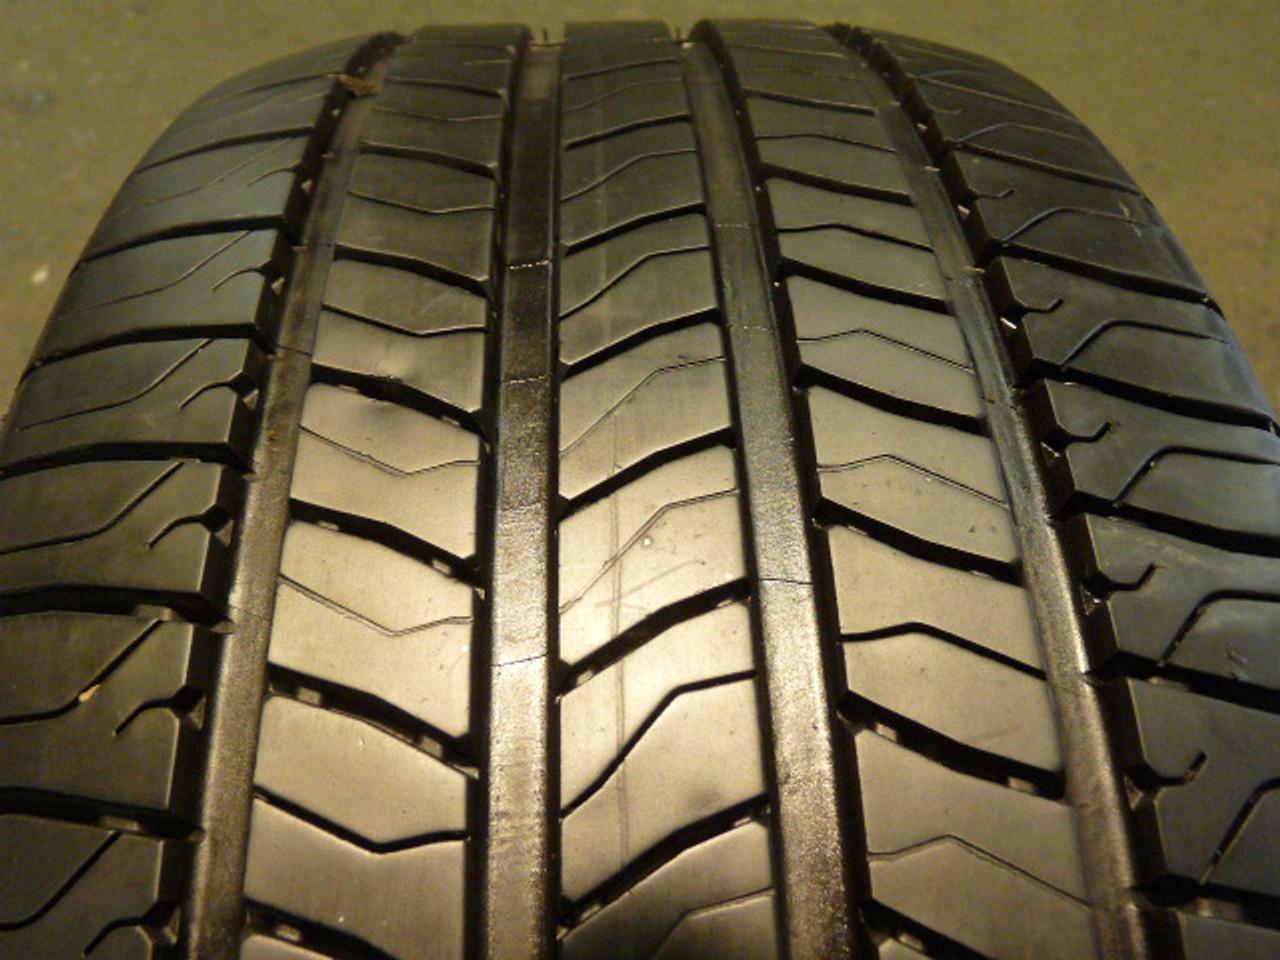 Used Take Off 225 60 16 Michelin Tire P225/60R16